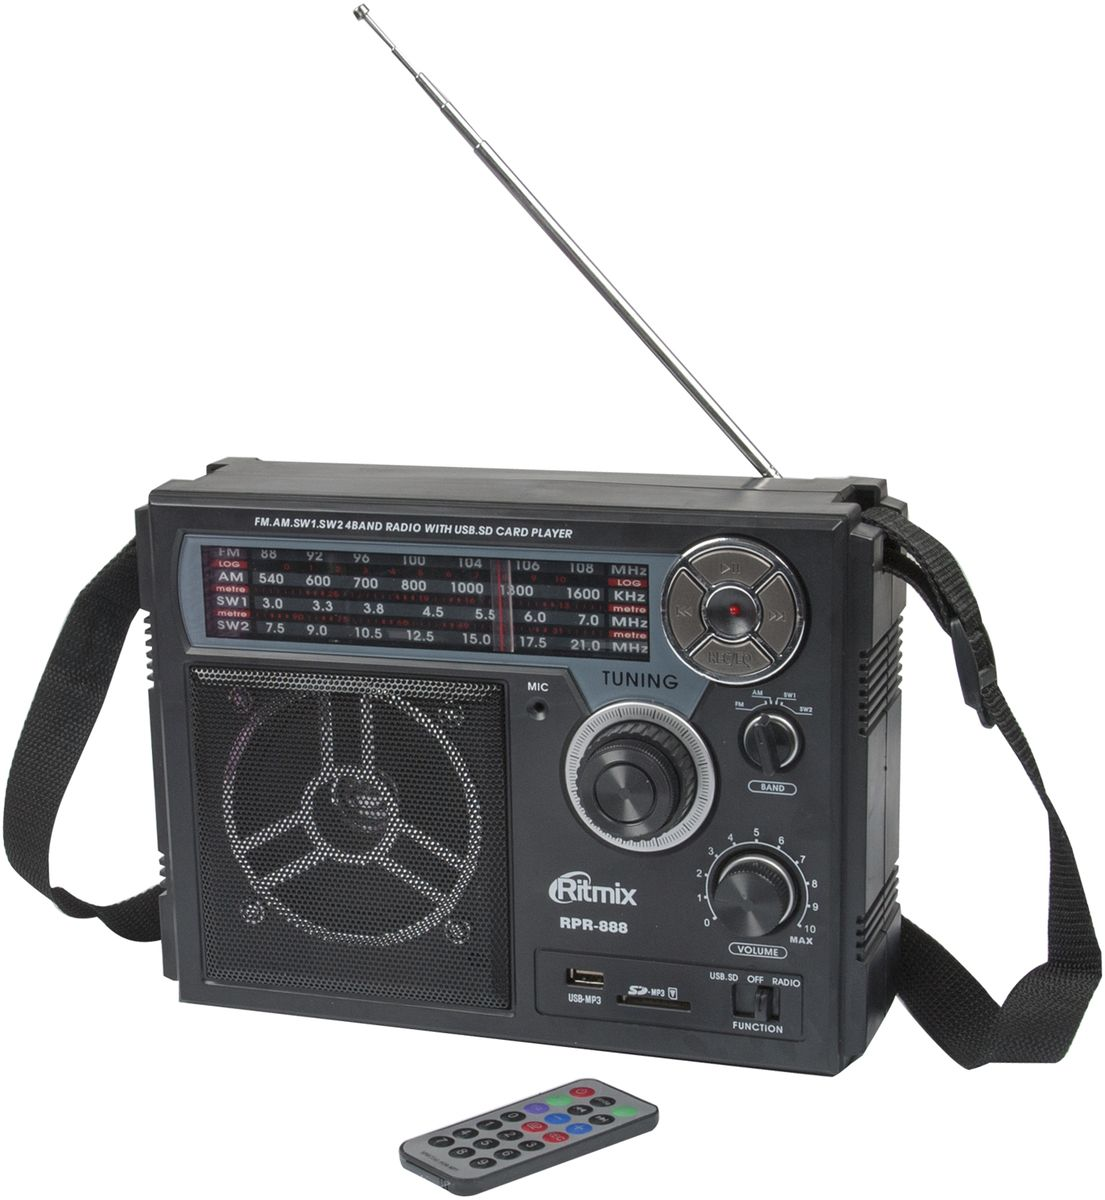 Ritmix RPR-888, Black радиоприемник ritmix rdf 1018 black цифровая фоторамка